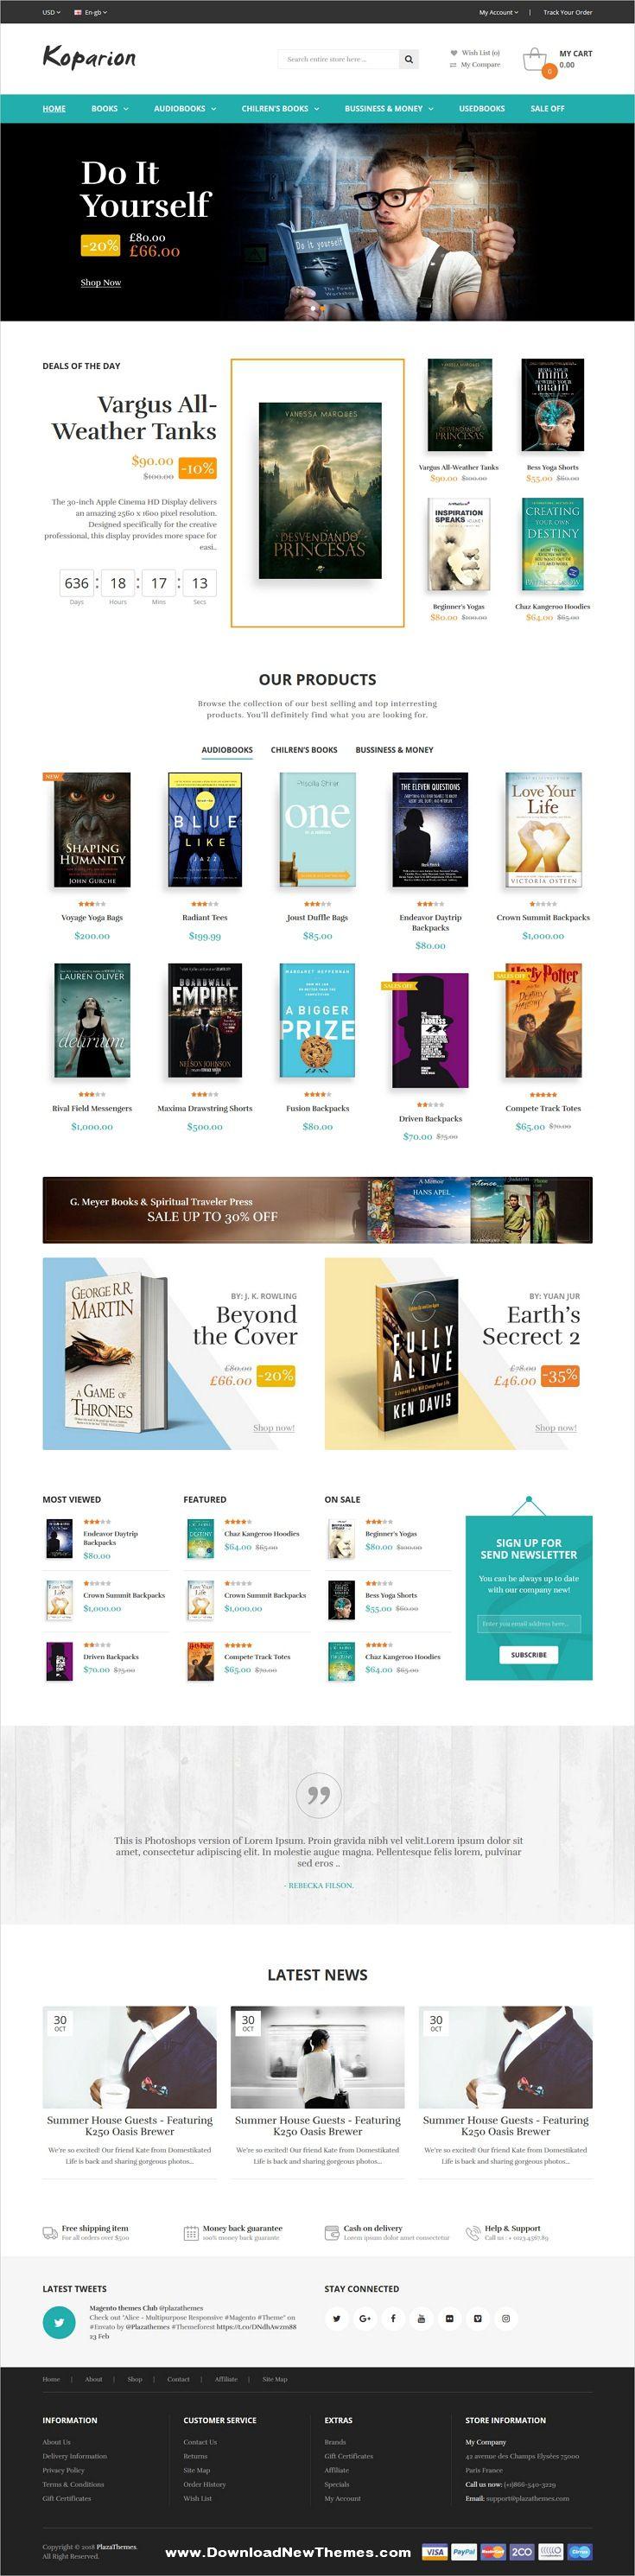 Koparion Book Shop Responsive Opencart Theme Ecommerce Web Design Opencart Online Bookstore